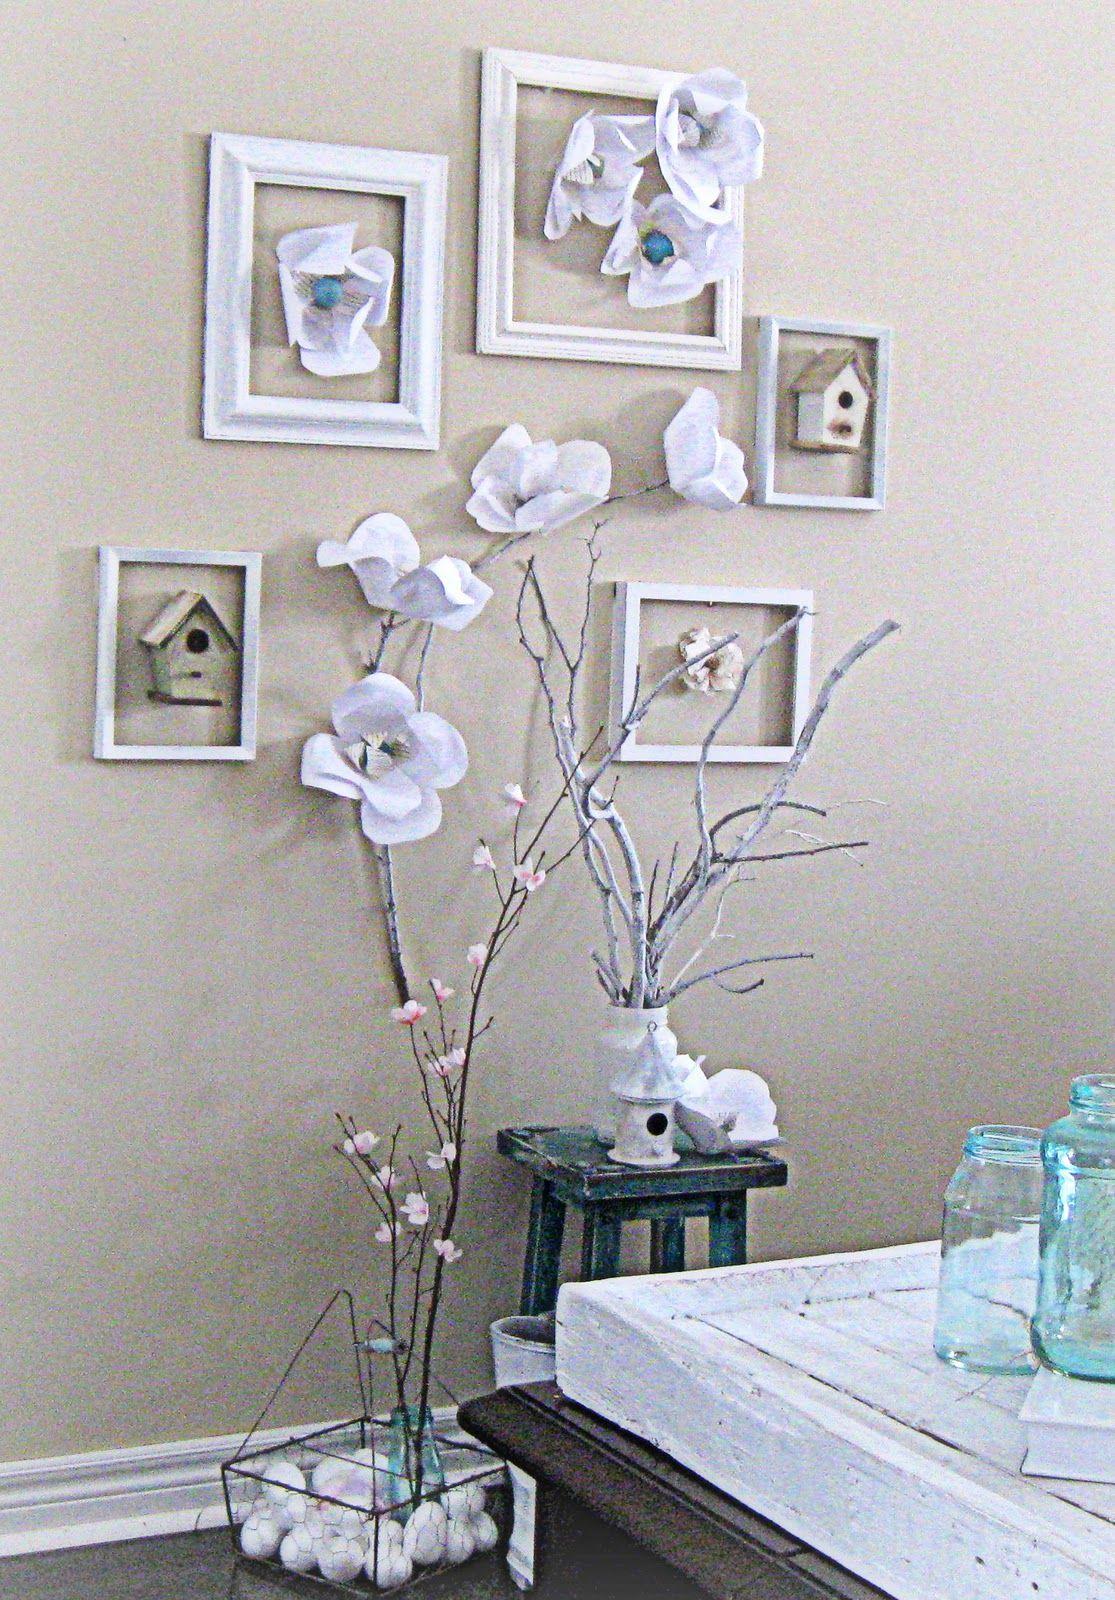 empty frames again, love the details | Diy :) | Pinterest | Empty ...